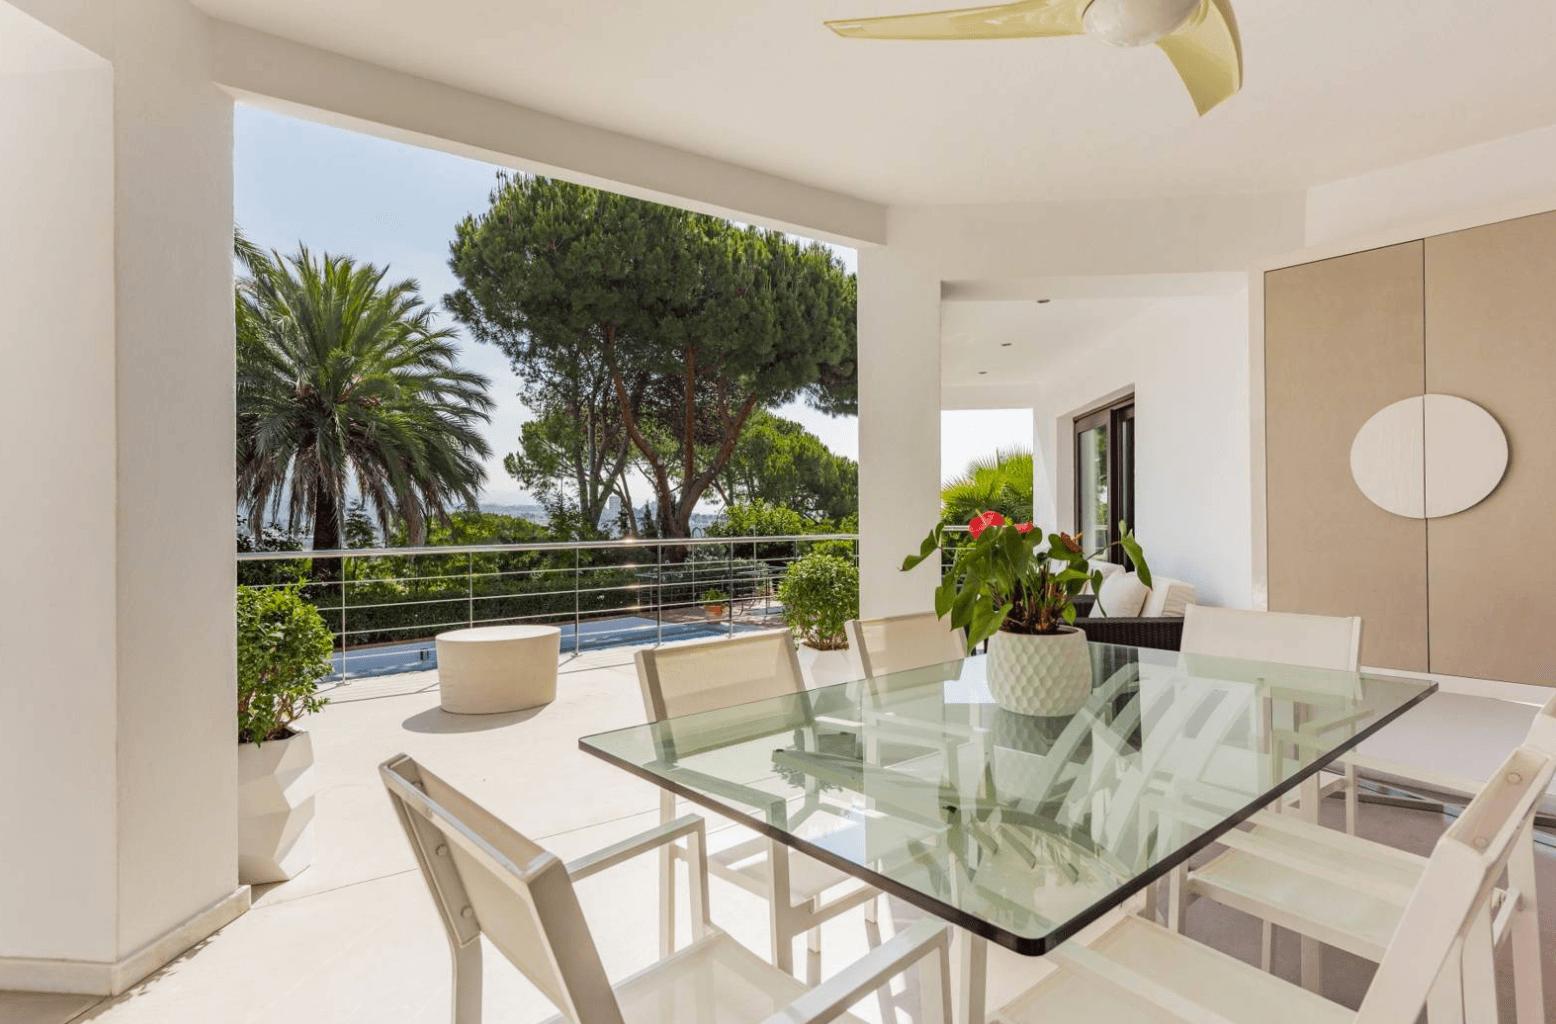 nueva andalucia moderne villa mit dachterrasse. Black Bedroom Furniture Sets. Home Design Ideas